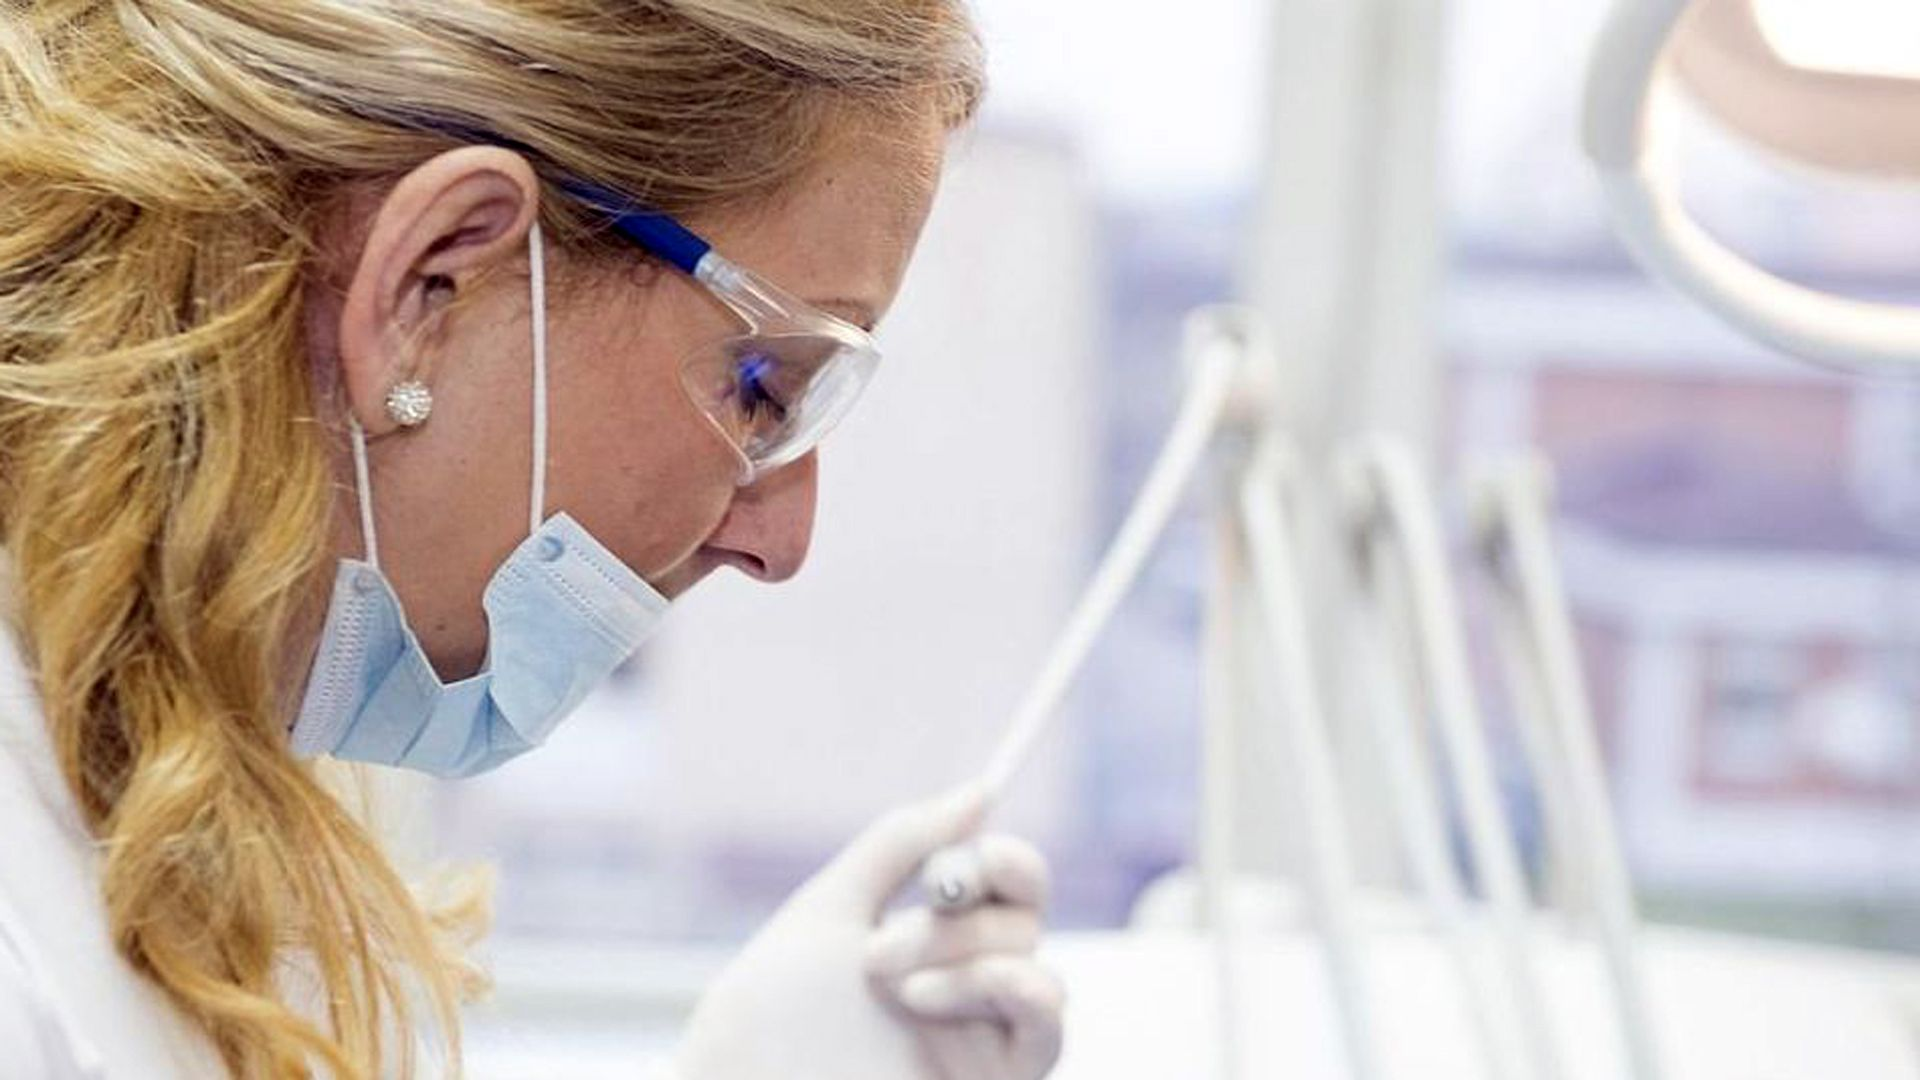 Clinica Dental: Especialidades de Clínica Dental Virgen del Carmen